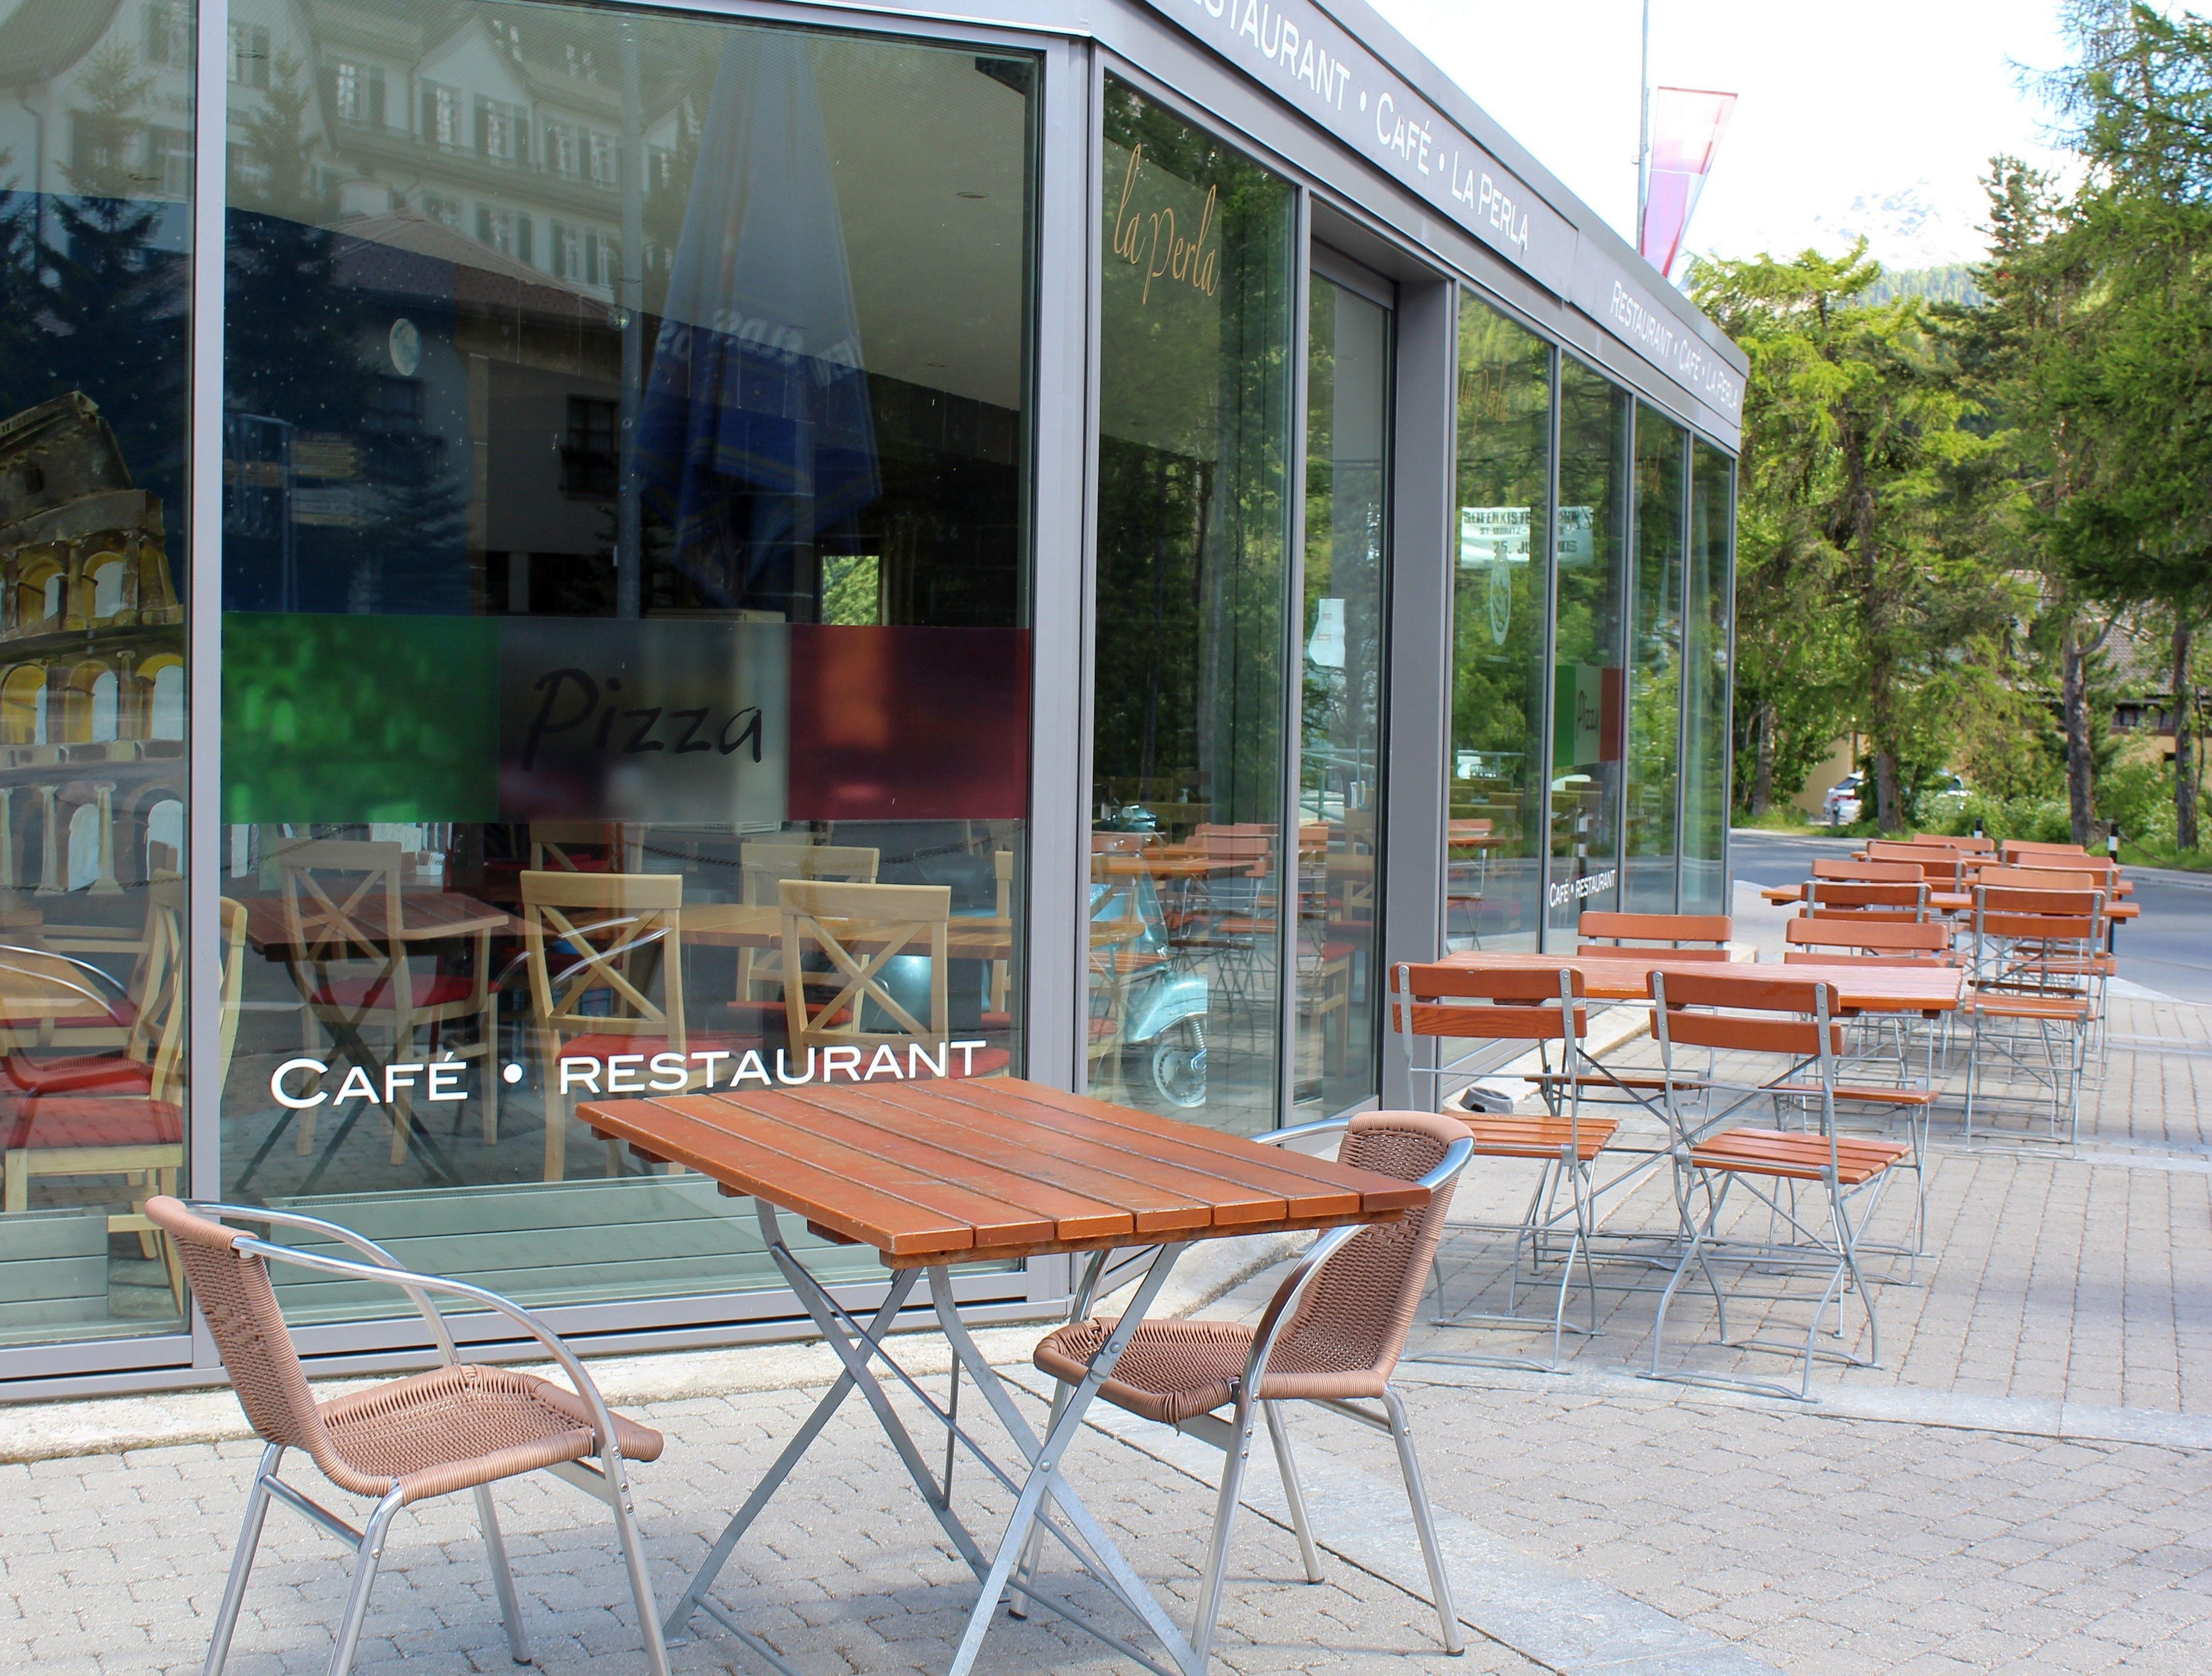 Café-Restaurant La Perla Slide 3